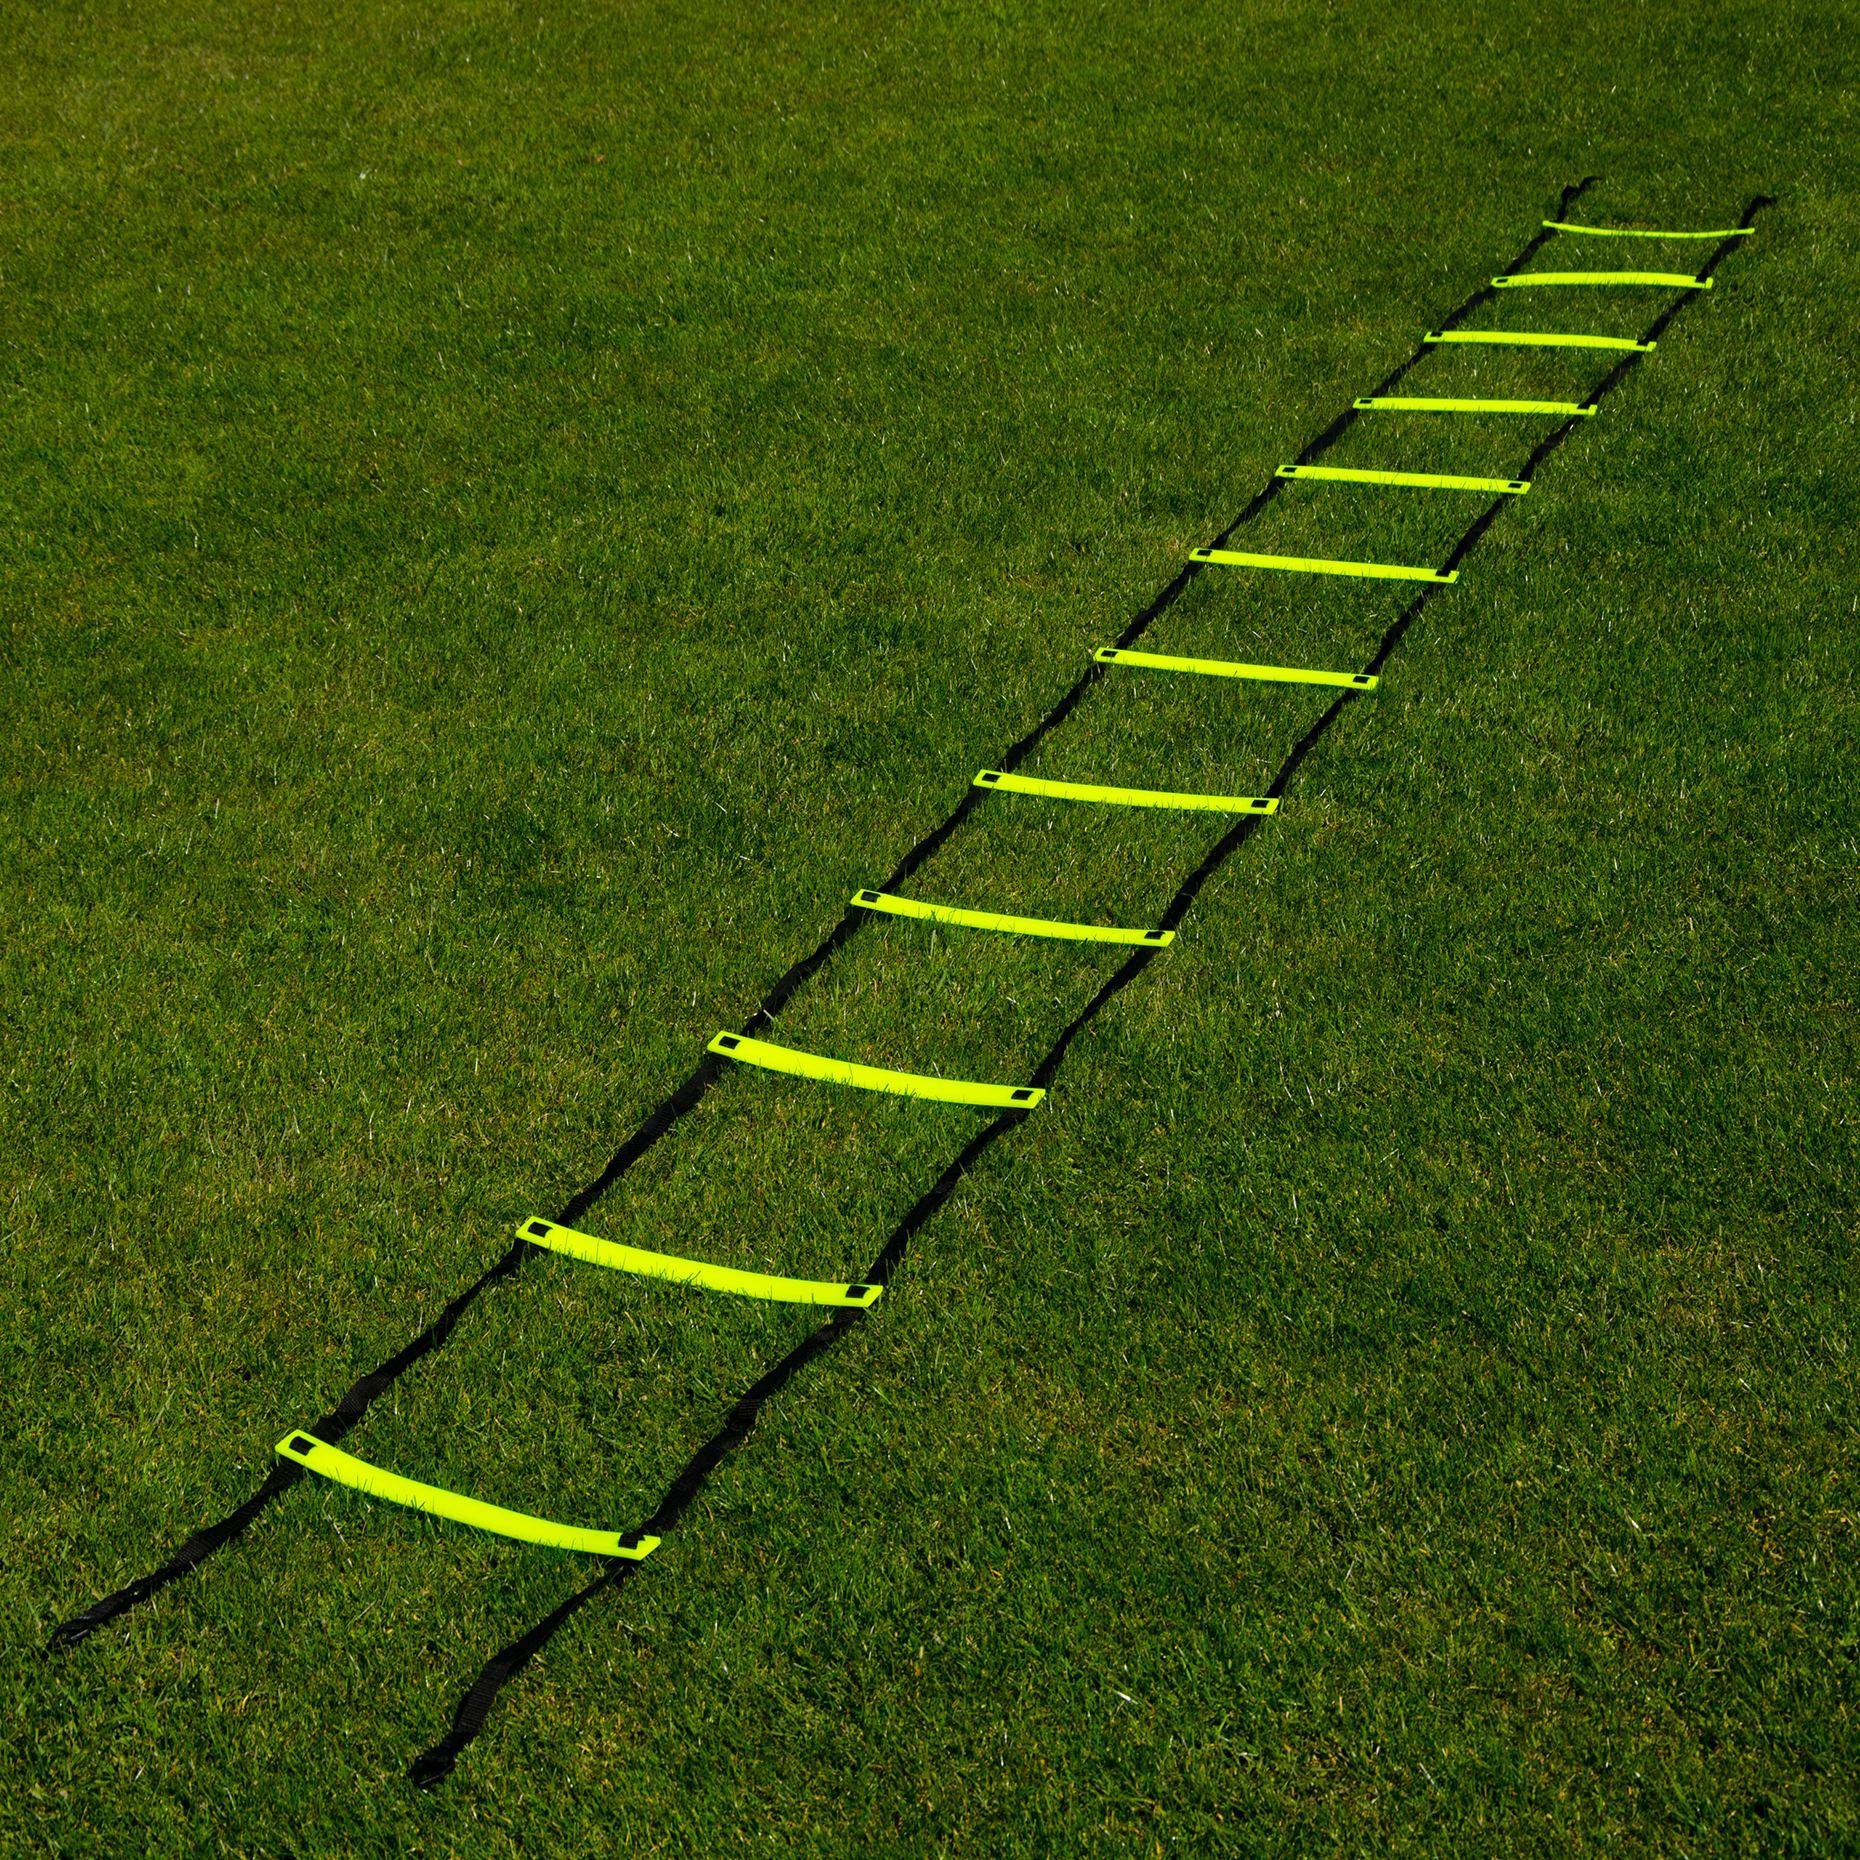 6m Forza Speed Amp Agility Football Training Ladder Net